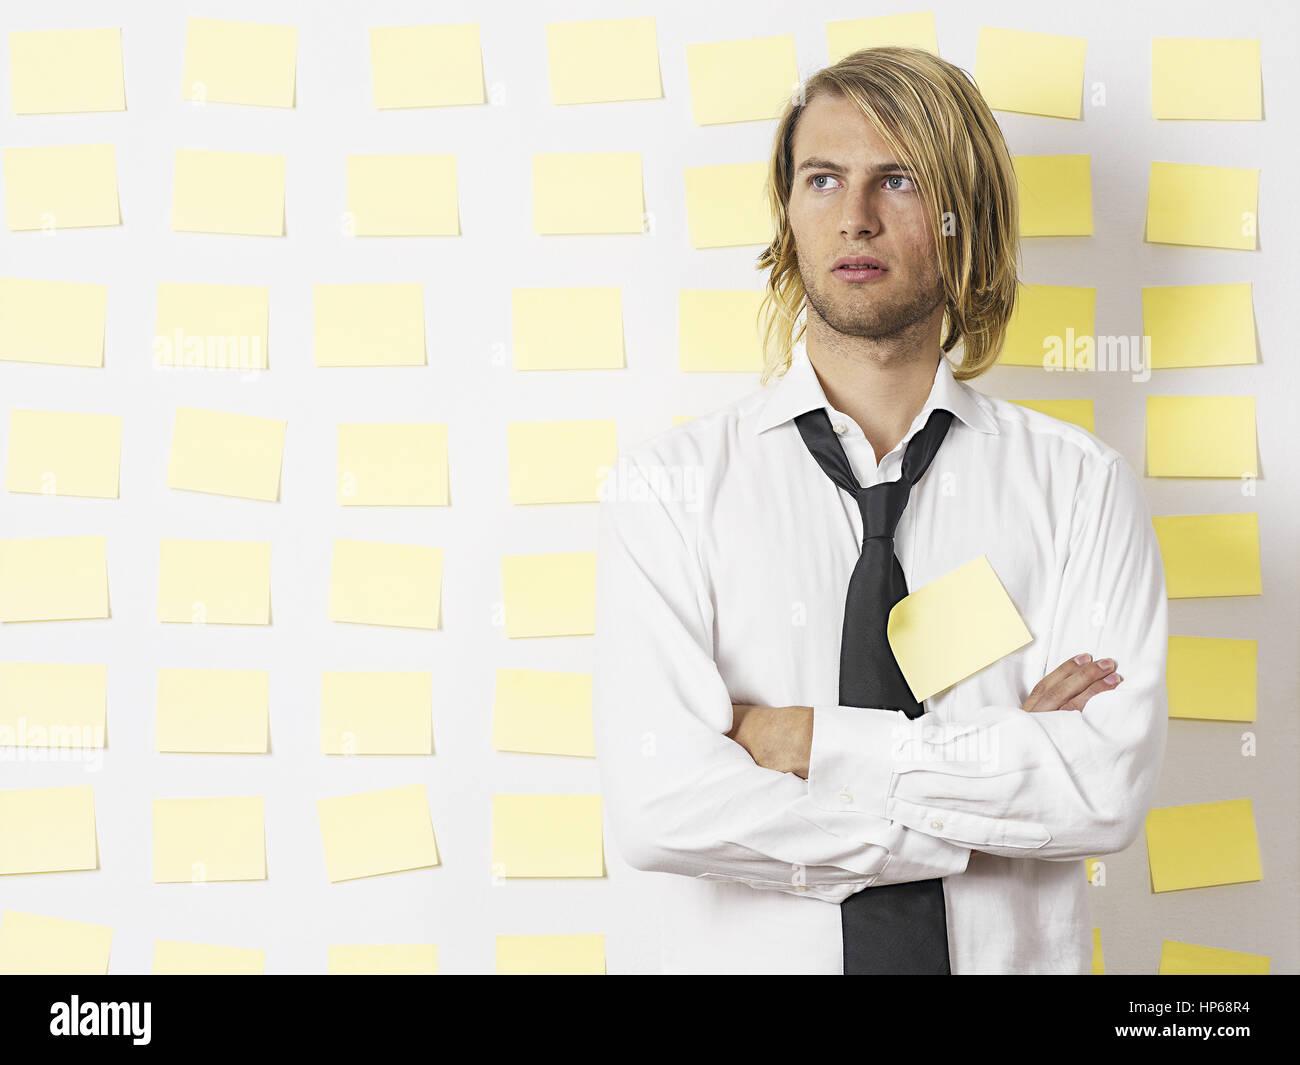 Junger Mann steht vor dans Postit-Wand Krawatte und Hemd, verschraenkte Terre Rouge (modèle récent) Banque D'Images